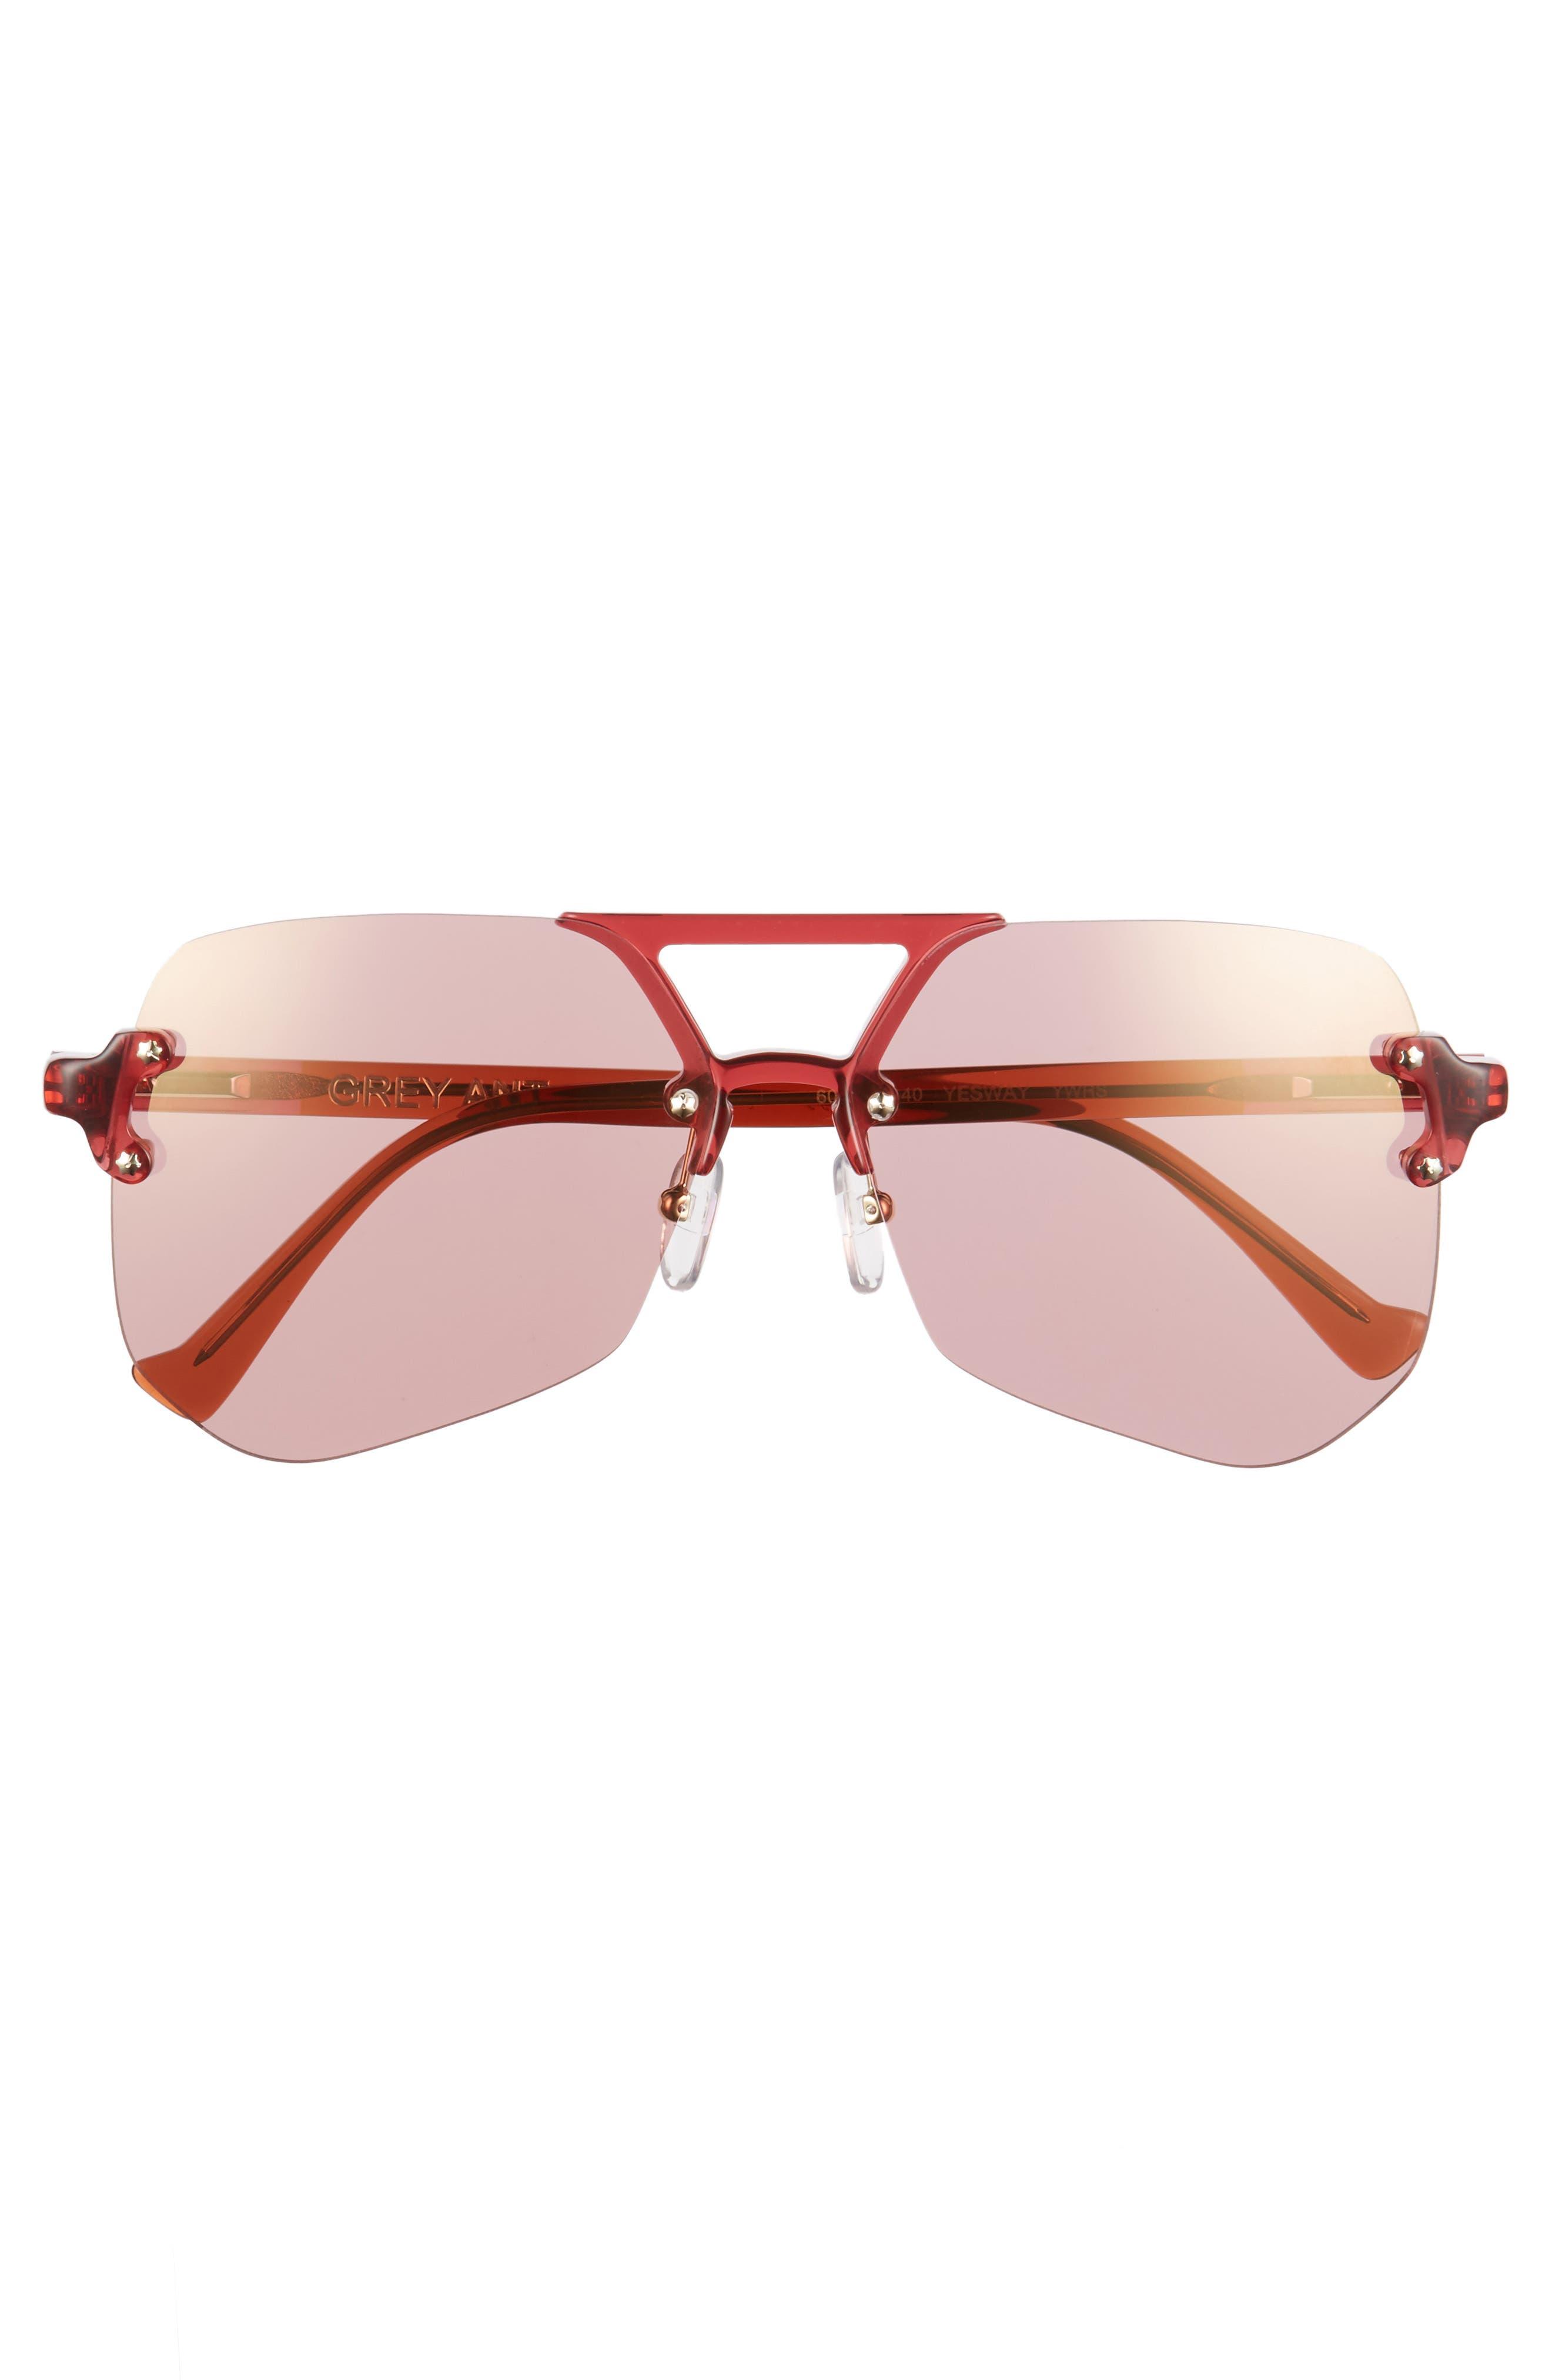 Yesway 60mm Sunglasses,                             Alternate thumbnail 3, color,                             Rose Lens/ Gold Hardware